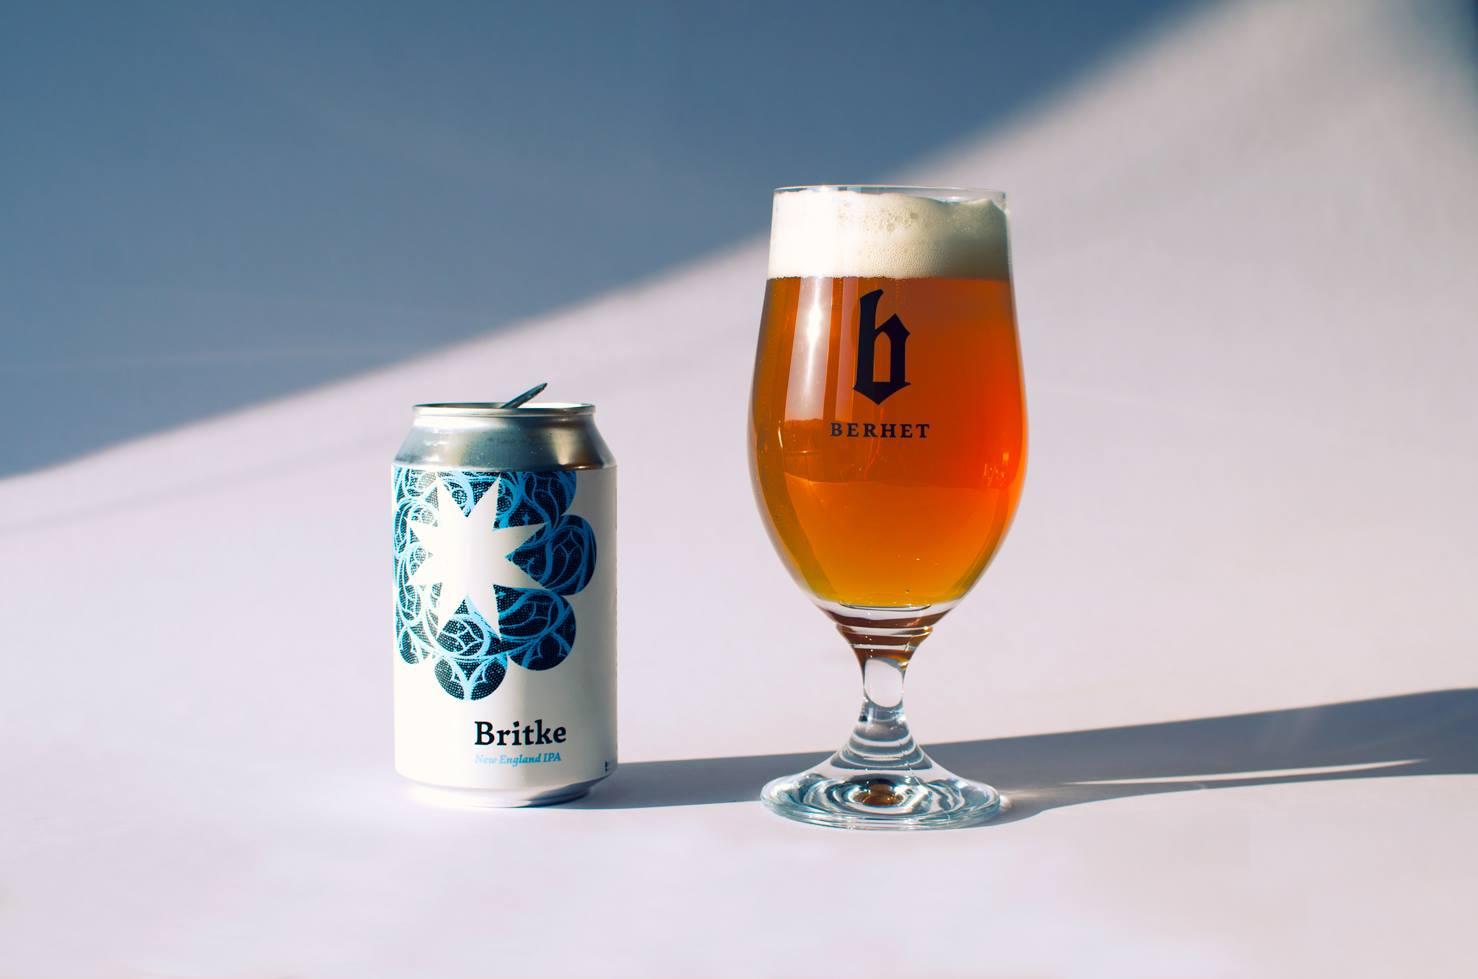 Berhet rozdáva Britke plechovky v Beer Station